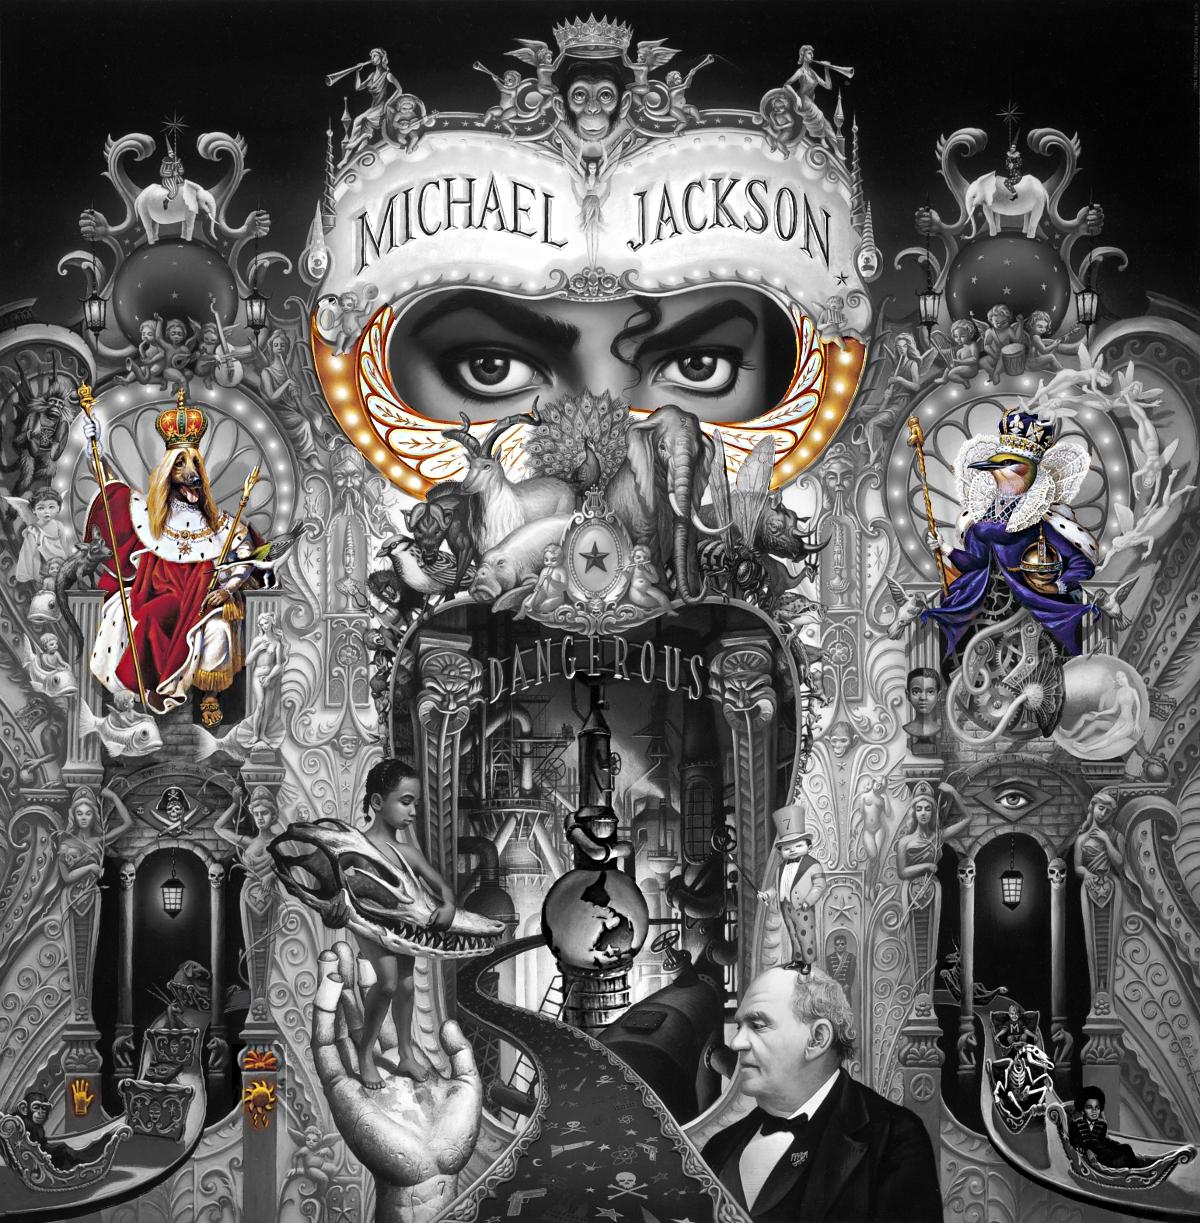 michael jackson dangerous album cover Captain EO explained meaning erklärt symbols symbole bedeutung ryden art dog king queen